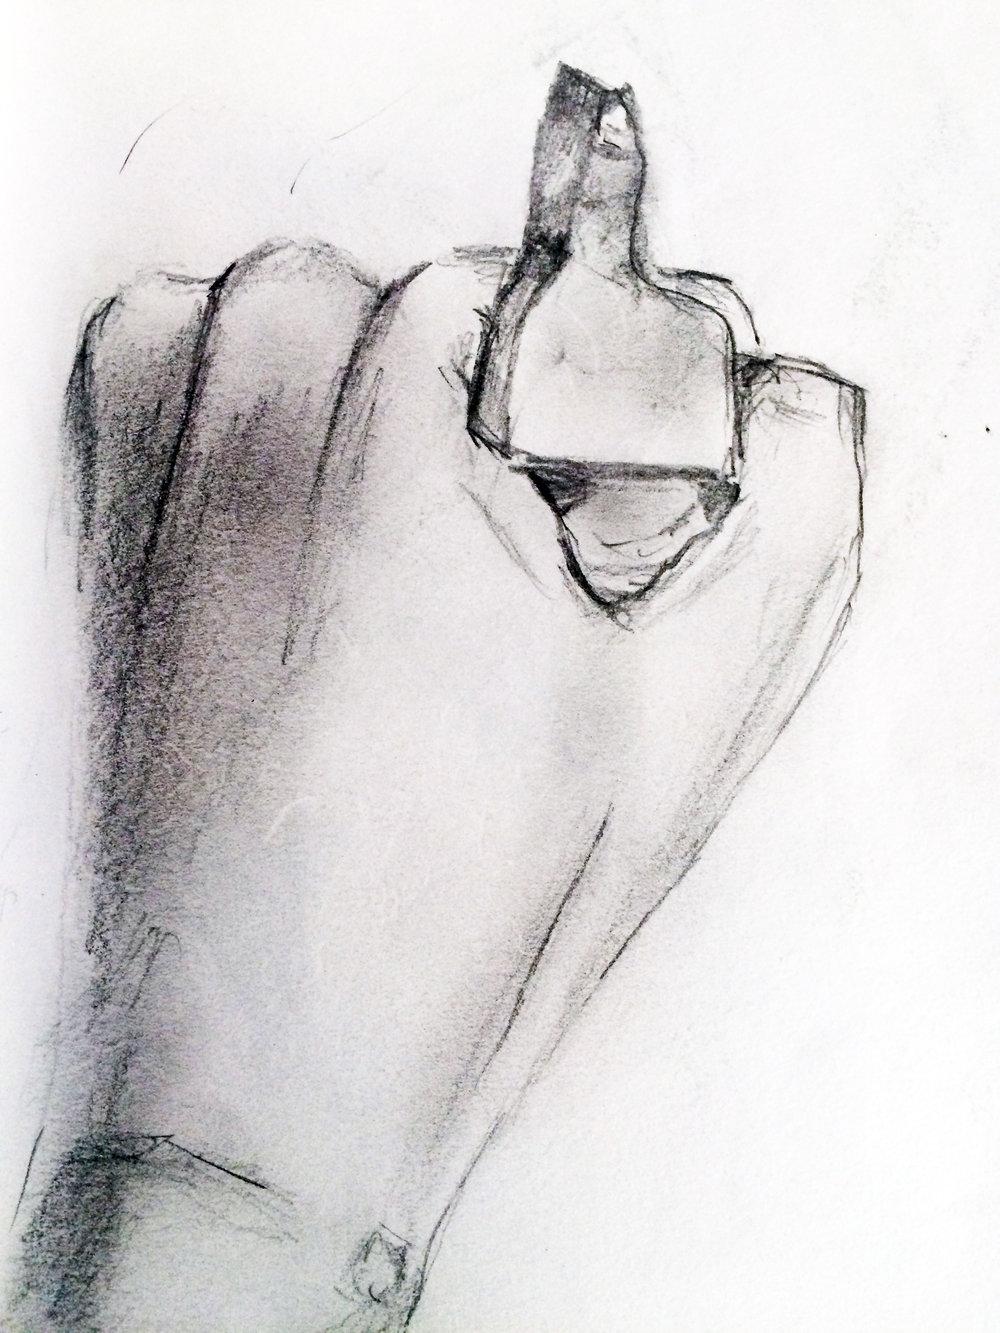 handpicture2.jpg